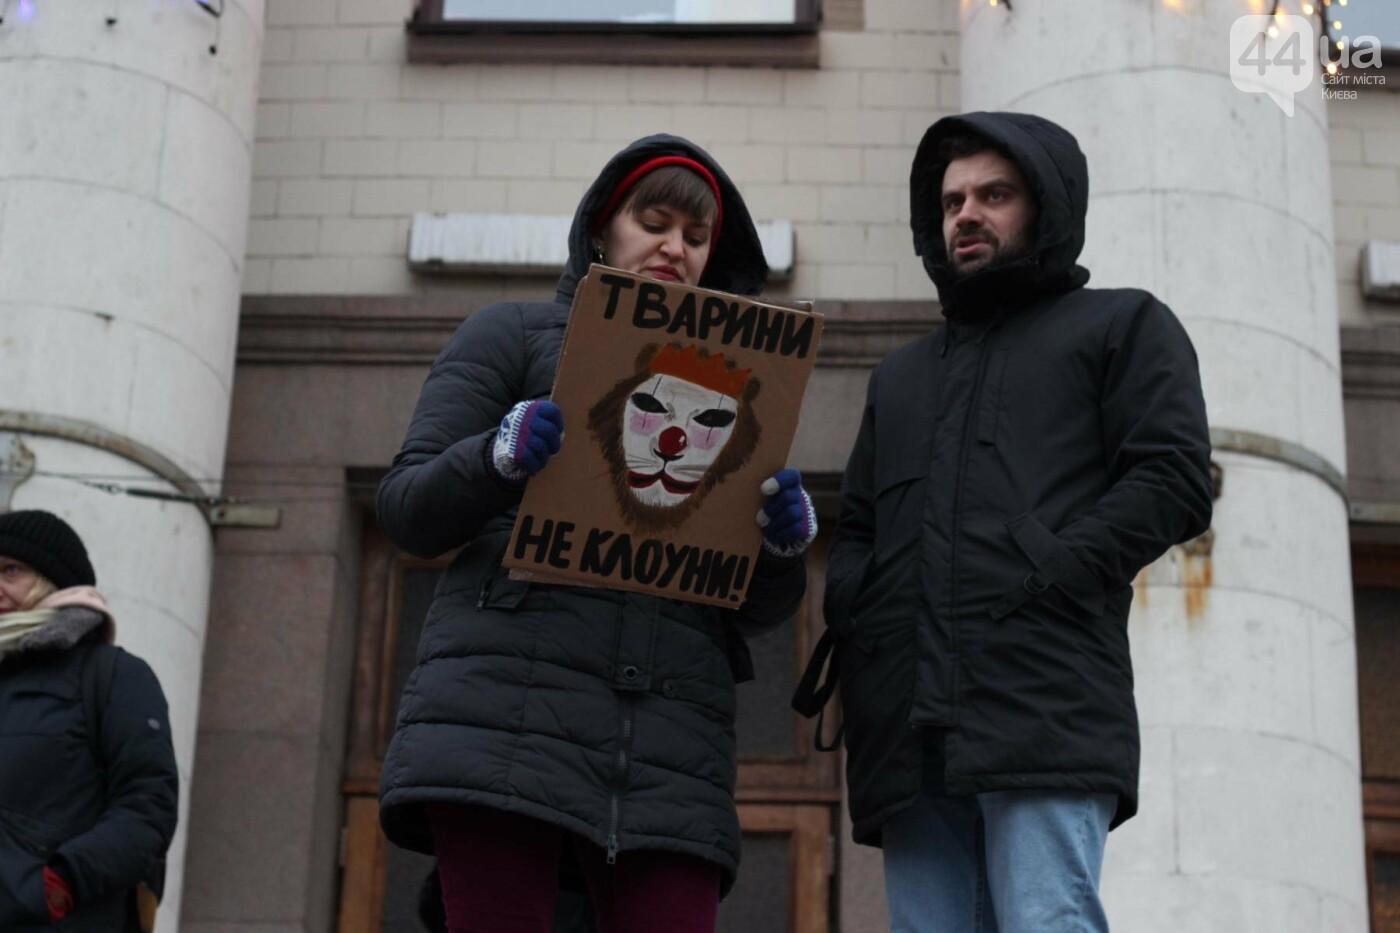 Цирк без животных: как в Киеве прошла акция протеста, фото-11